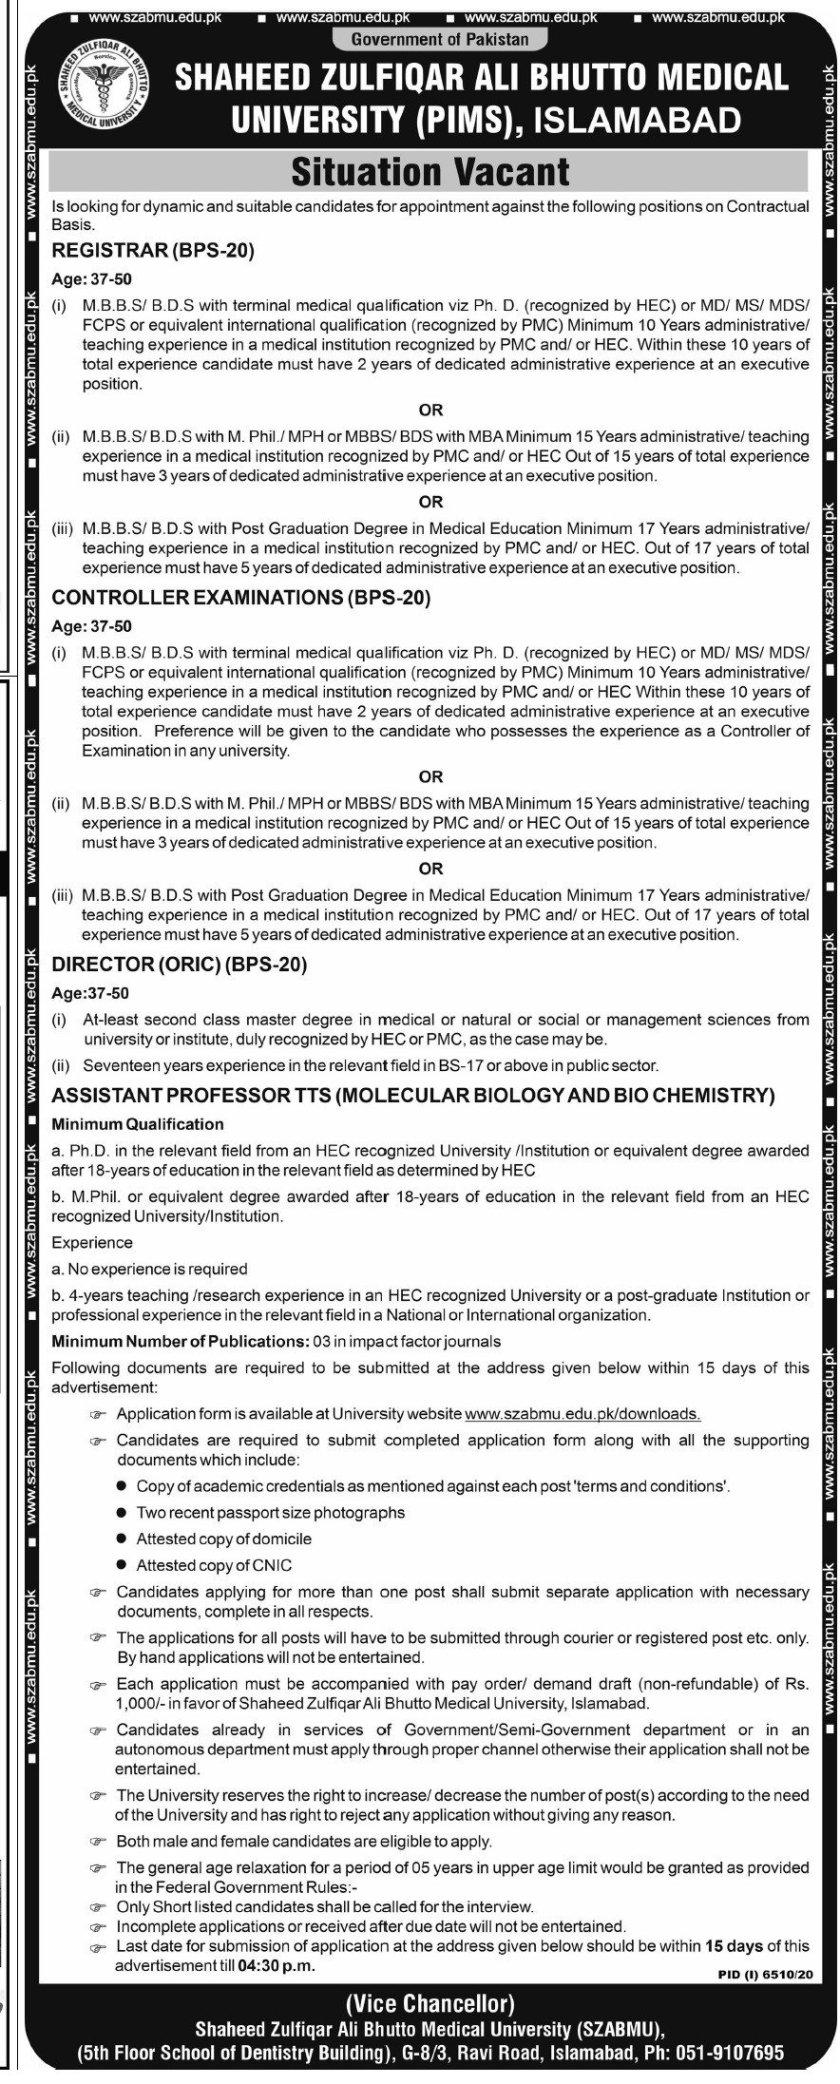 Shaheed Zulfiqar Ali Bhutto Medical University Islamabad SZABMU Jobs 2021